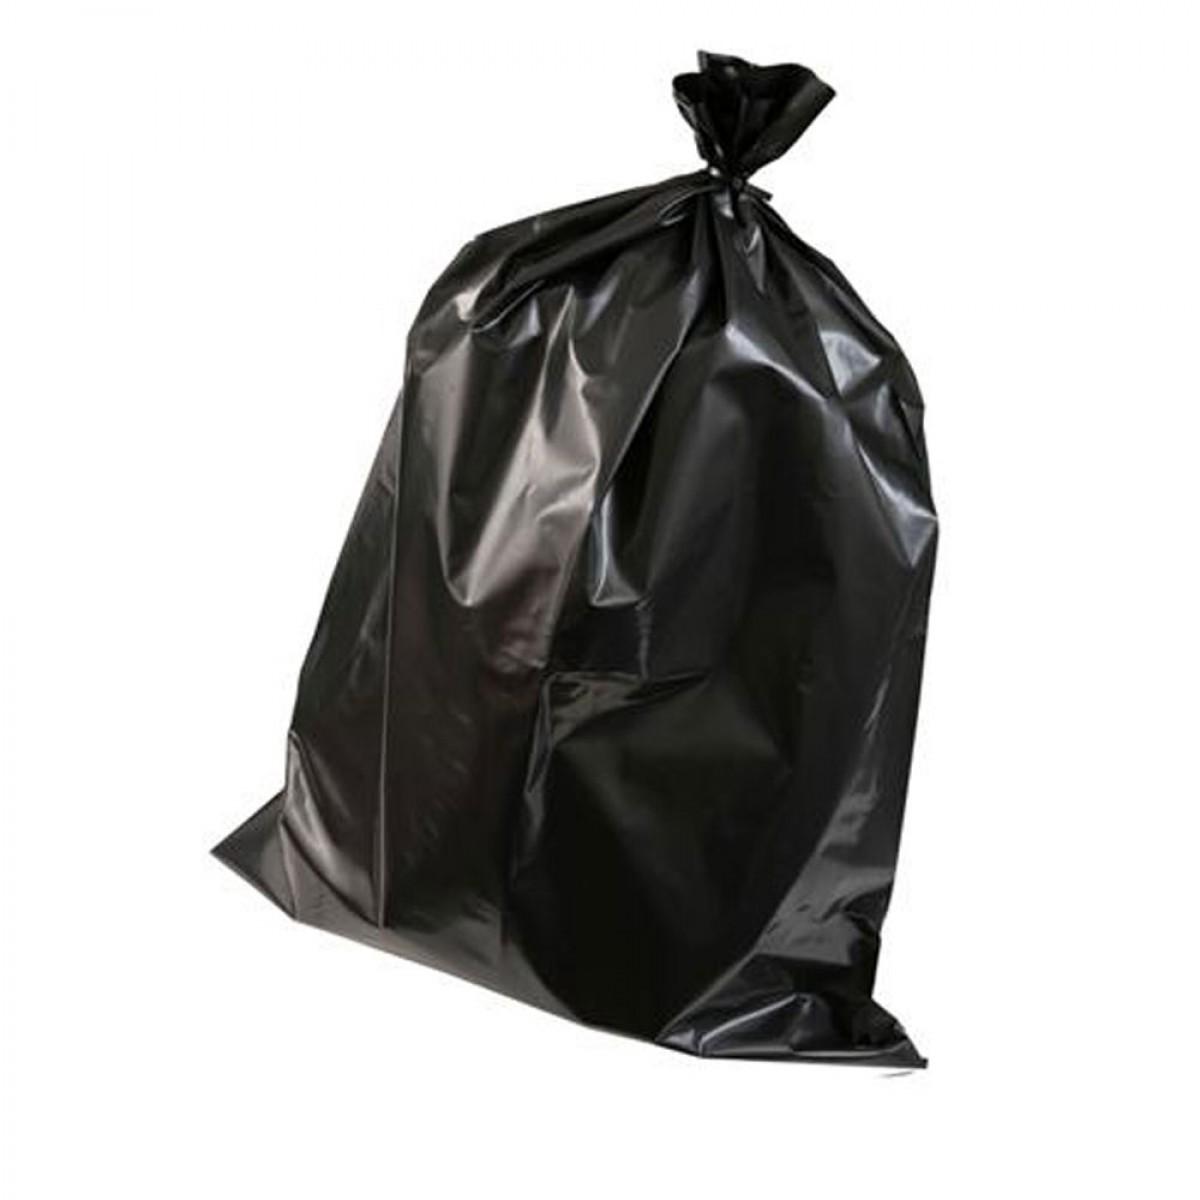 rubble sack.jpg